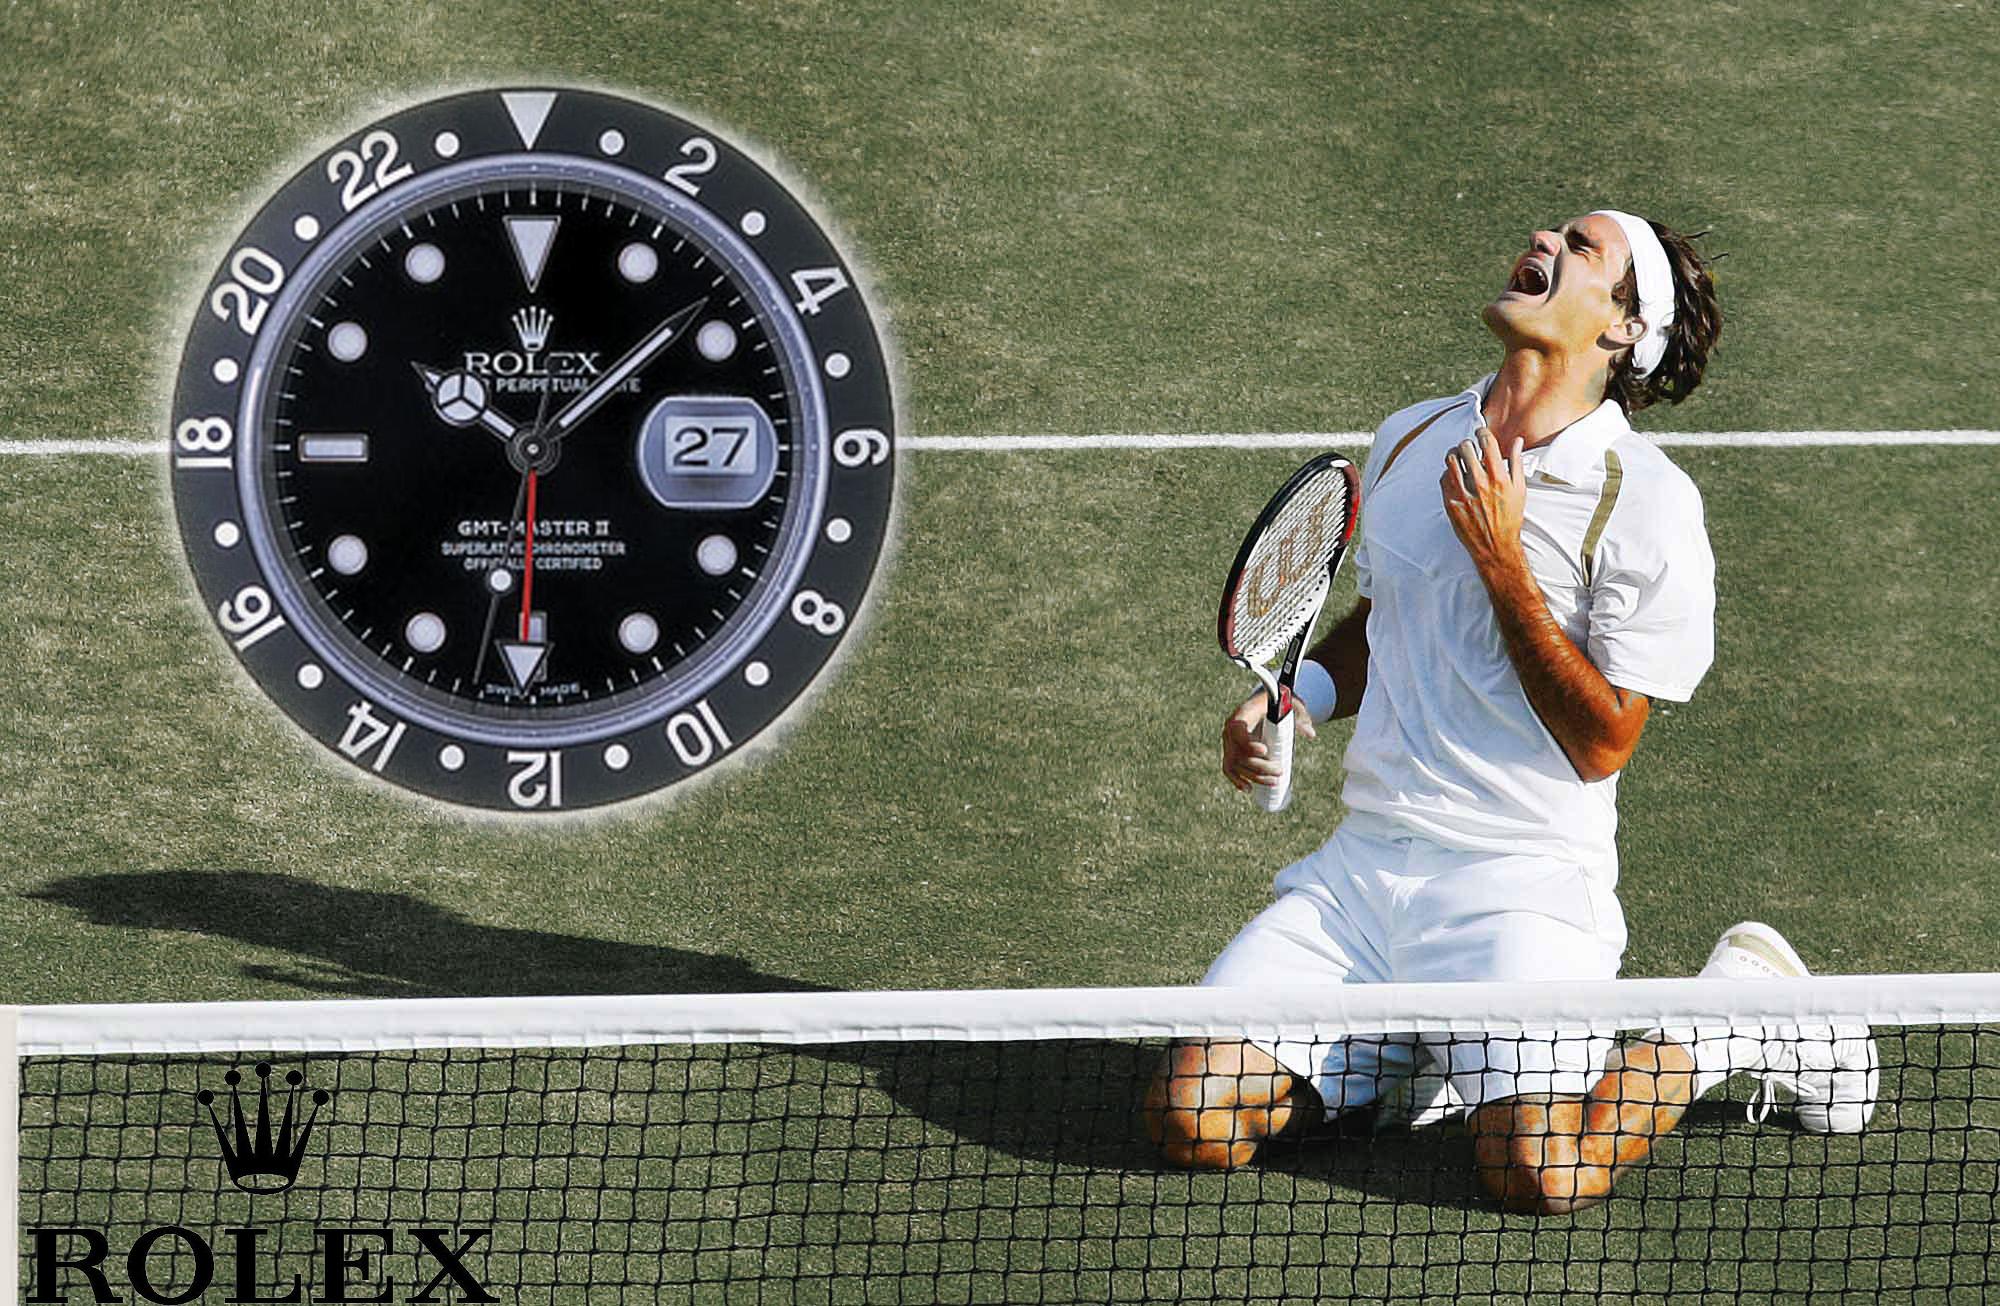 Roger Sexy - Página 2 Federer-wimbledon-rolex